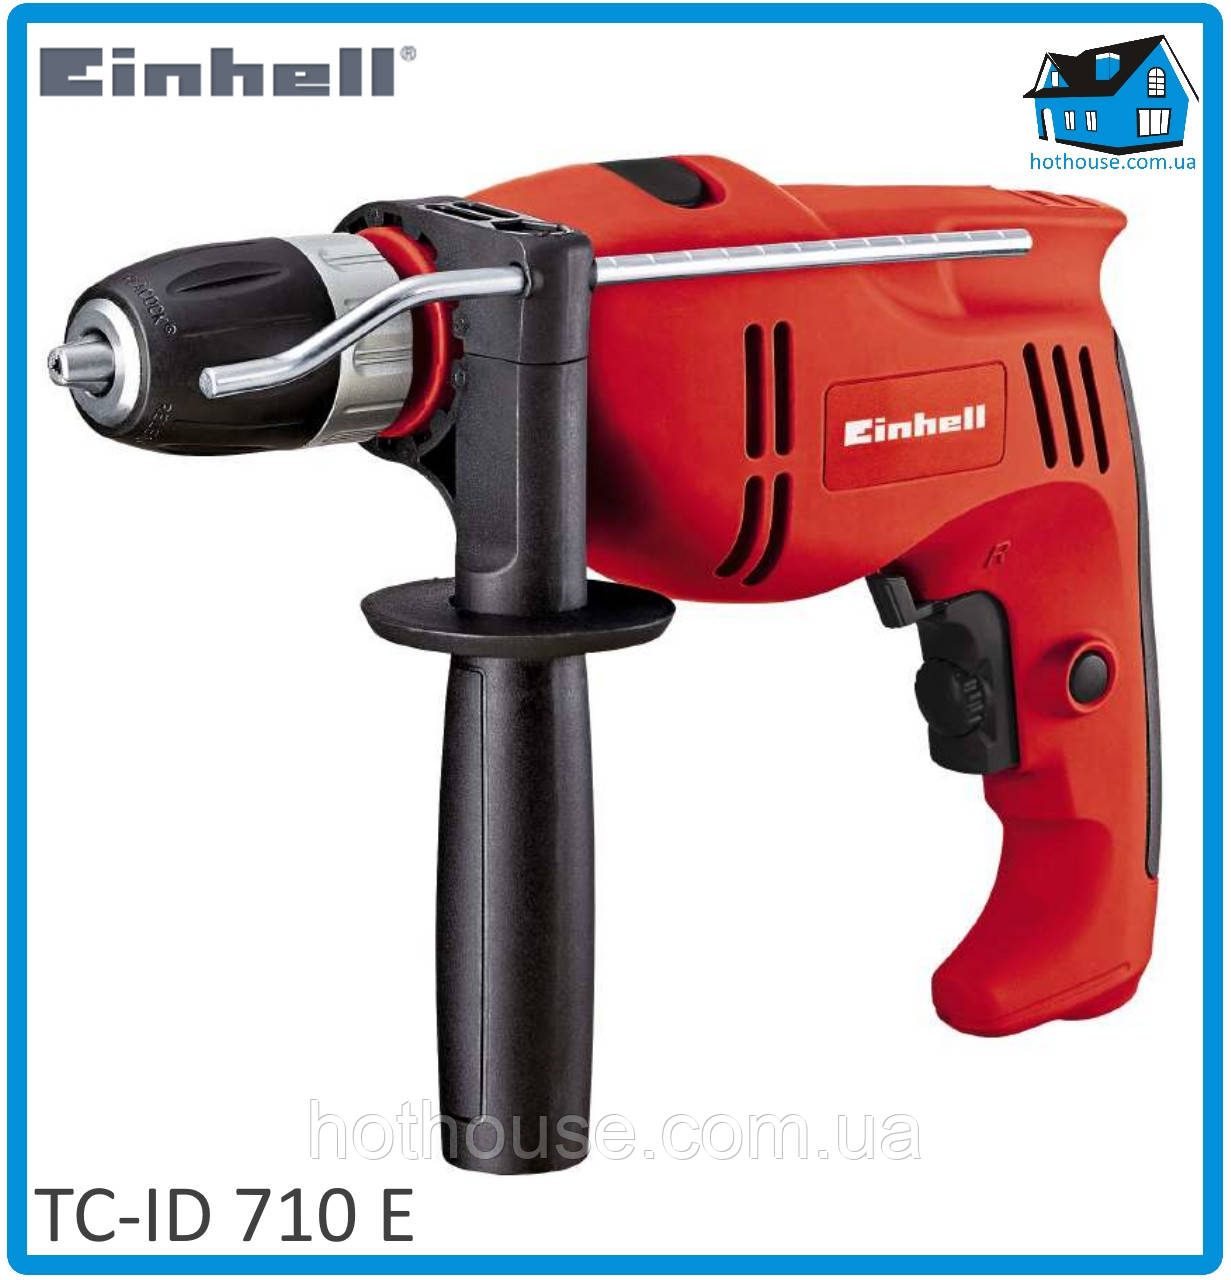 Дрель с ударом Einhell TC-ID 710 E